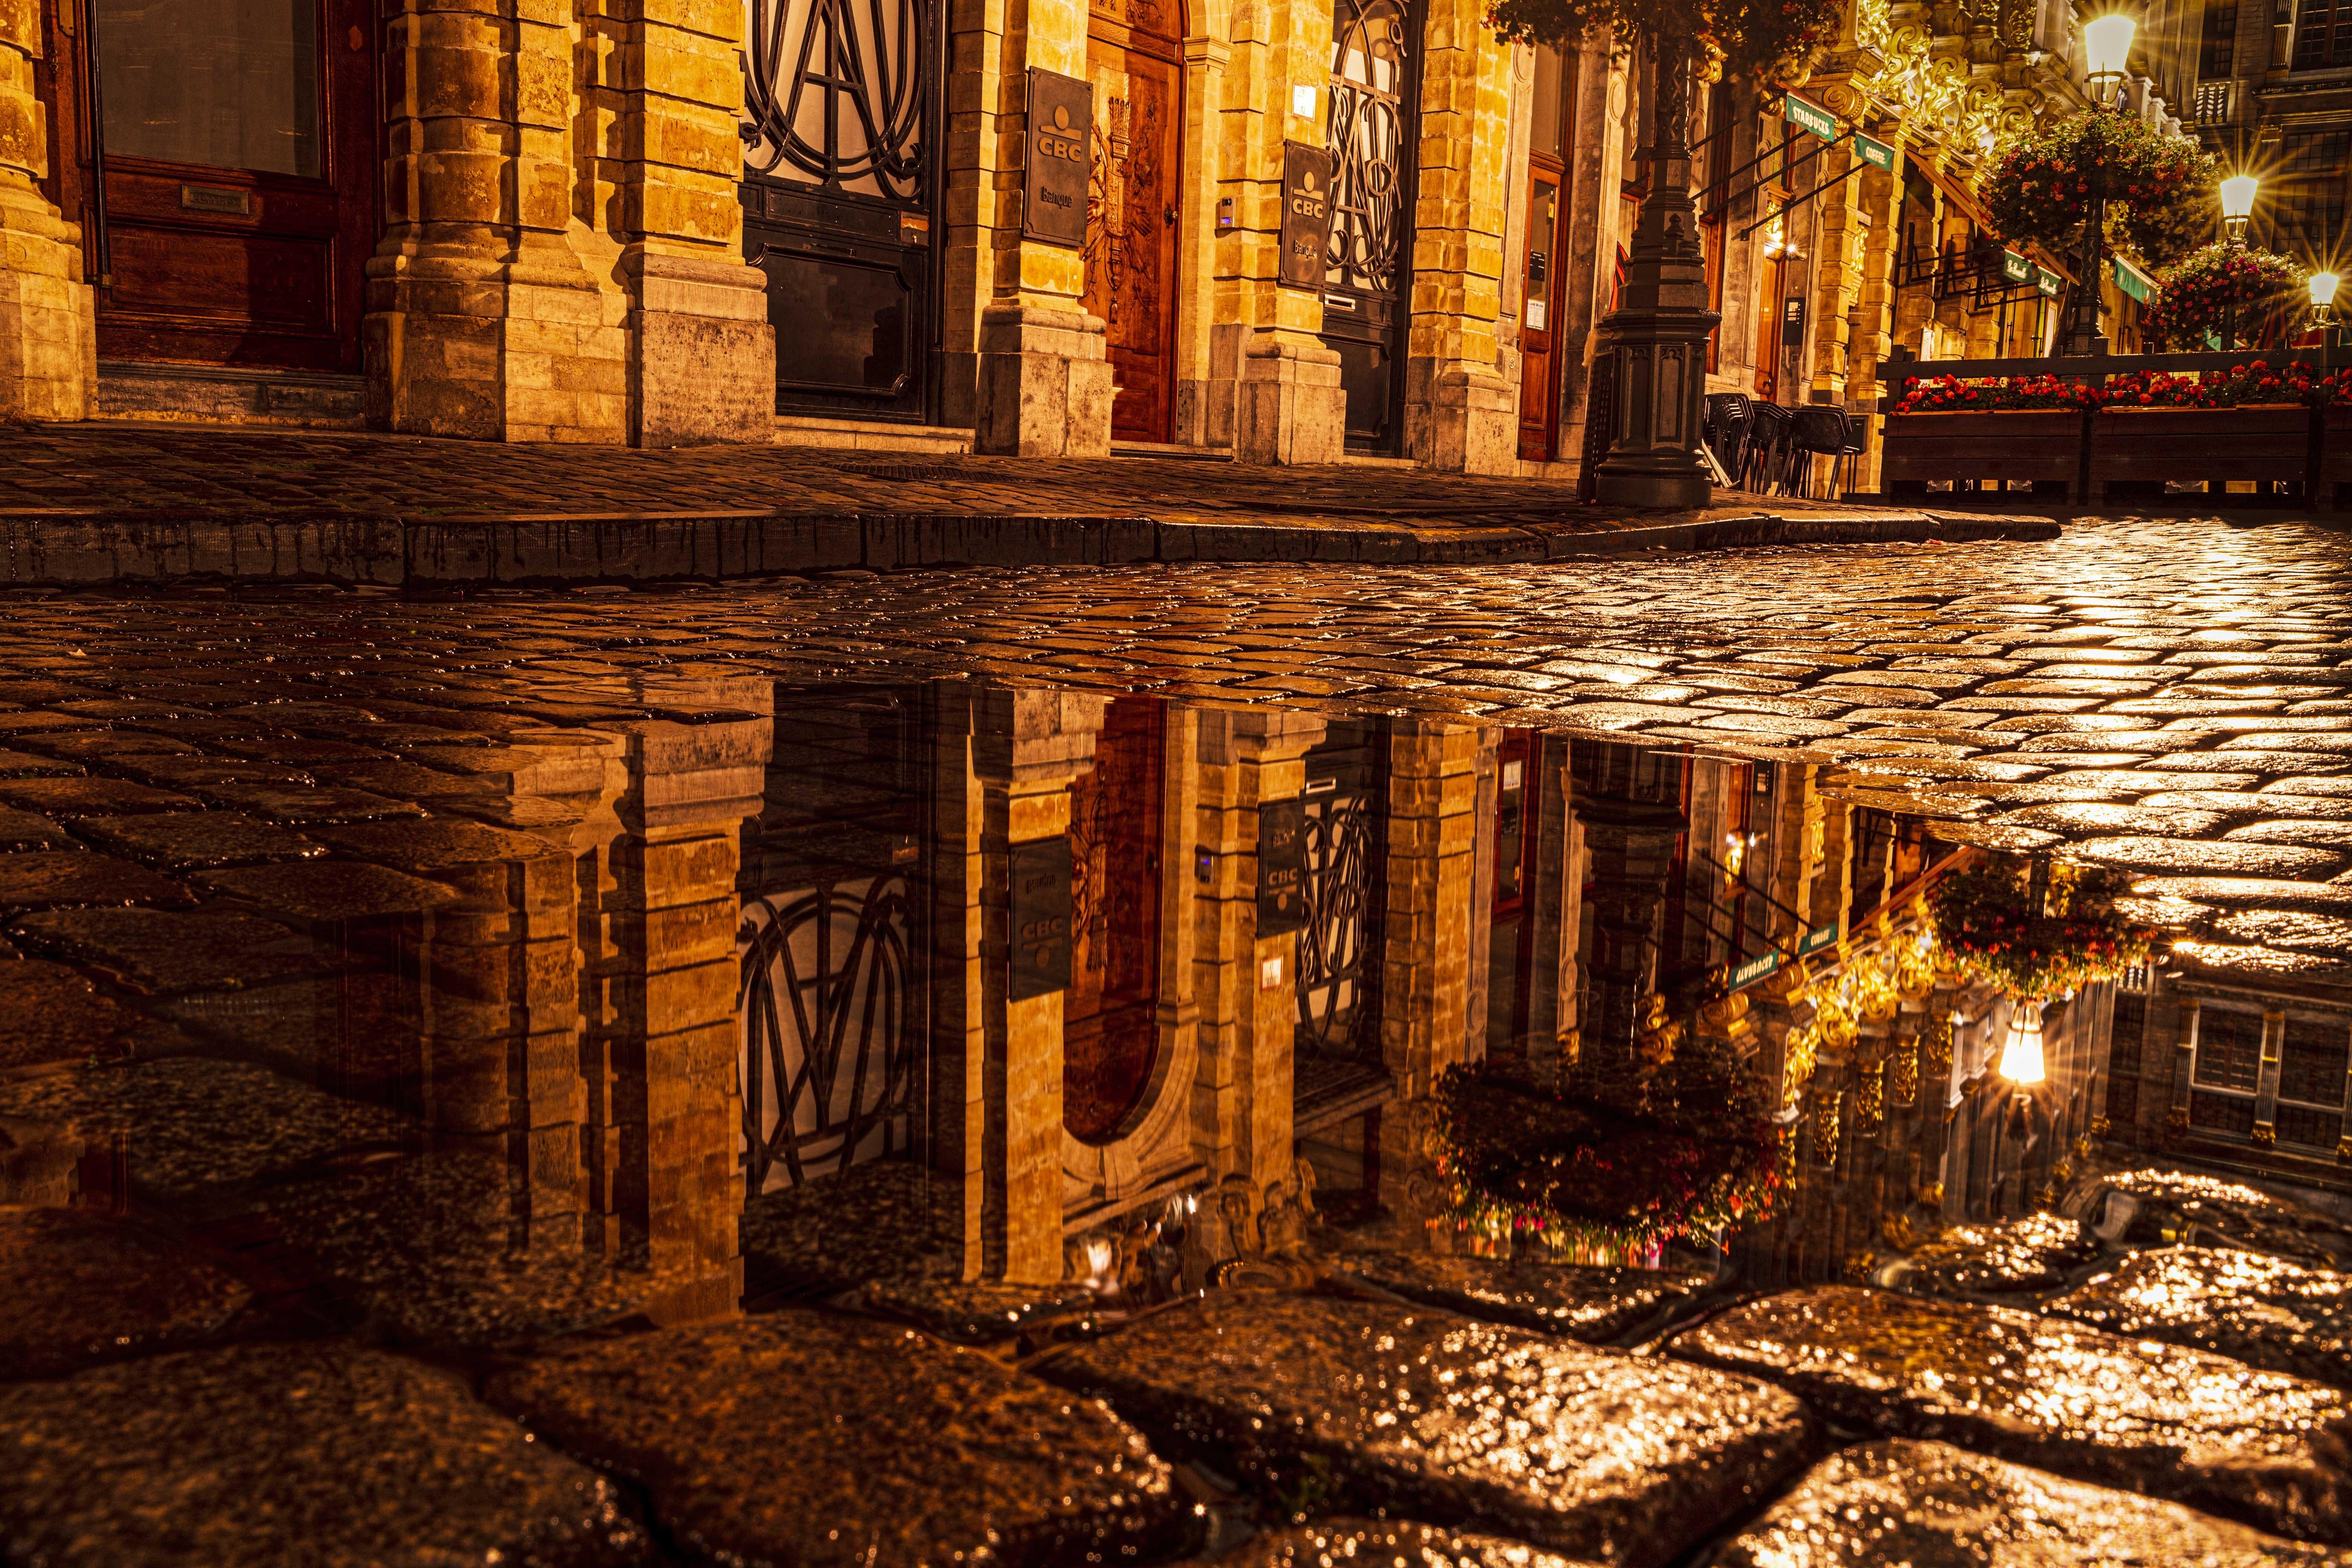 Brussles Reflection by Michael Osborne